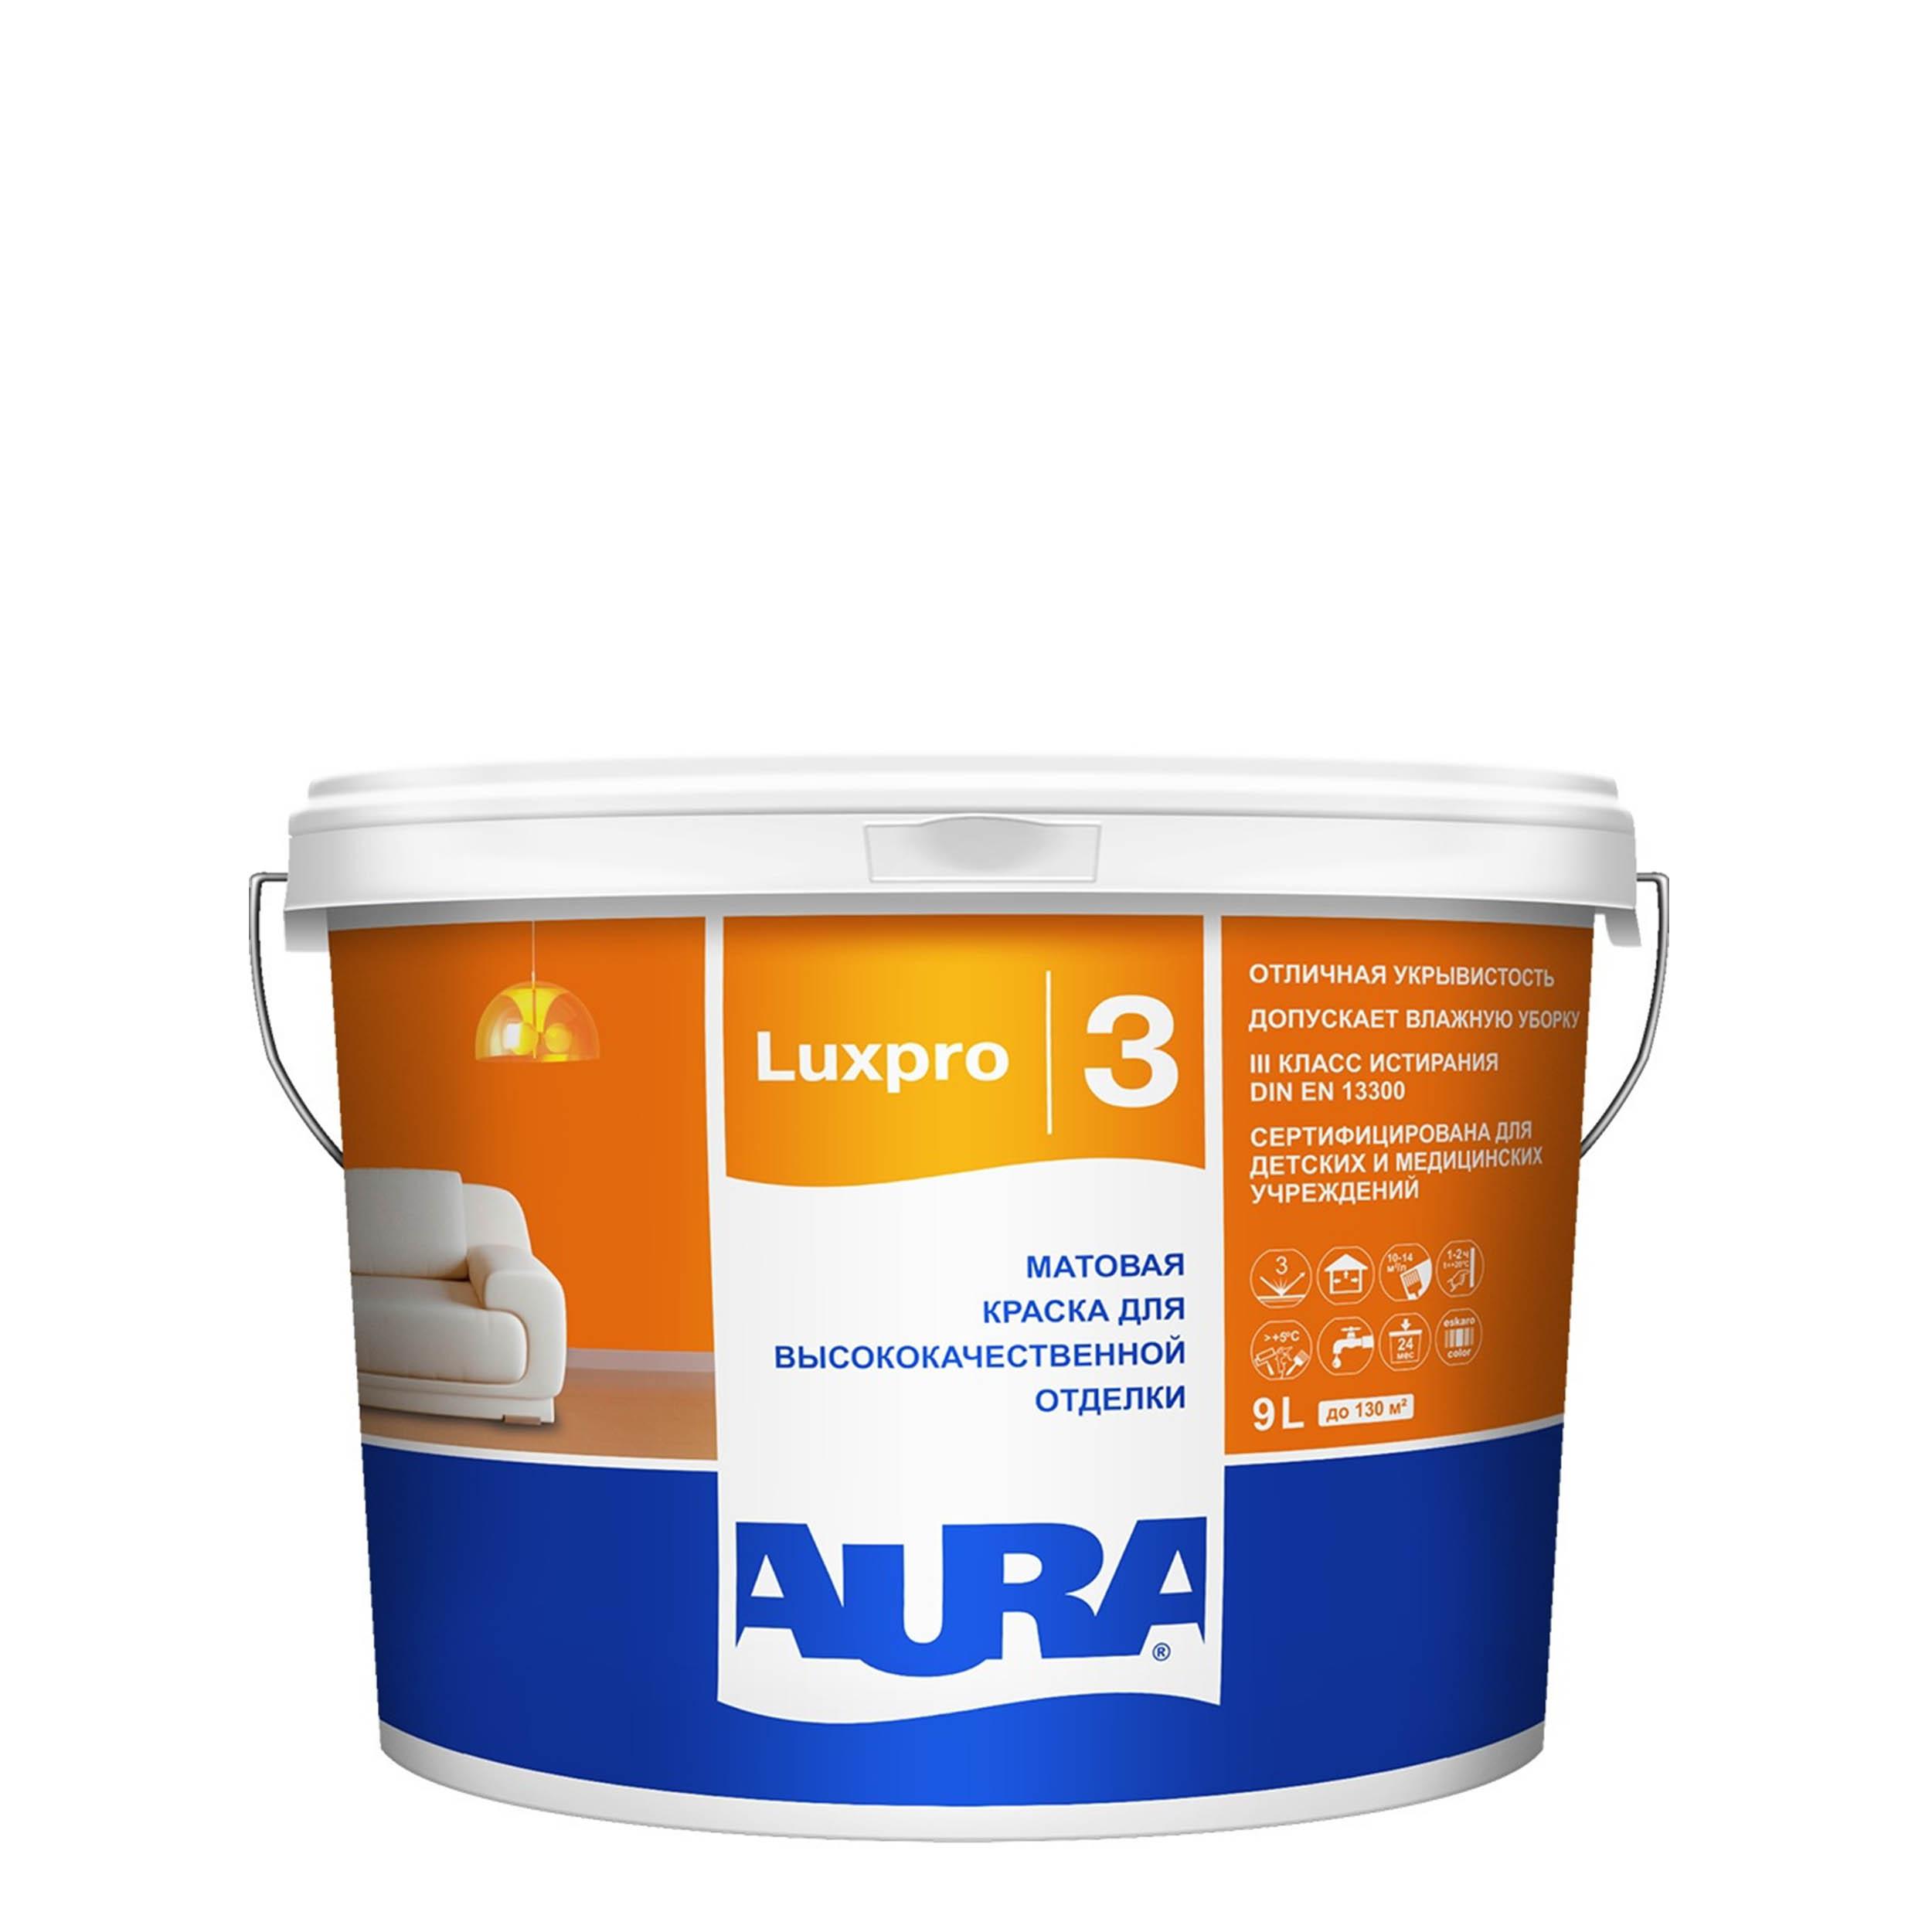 Фото 3 - Краска интерьерная, Aura LuxPRO 3, RAL 9017, 11 кг.